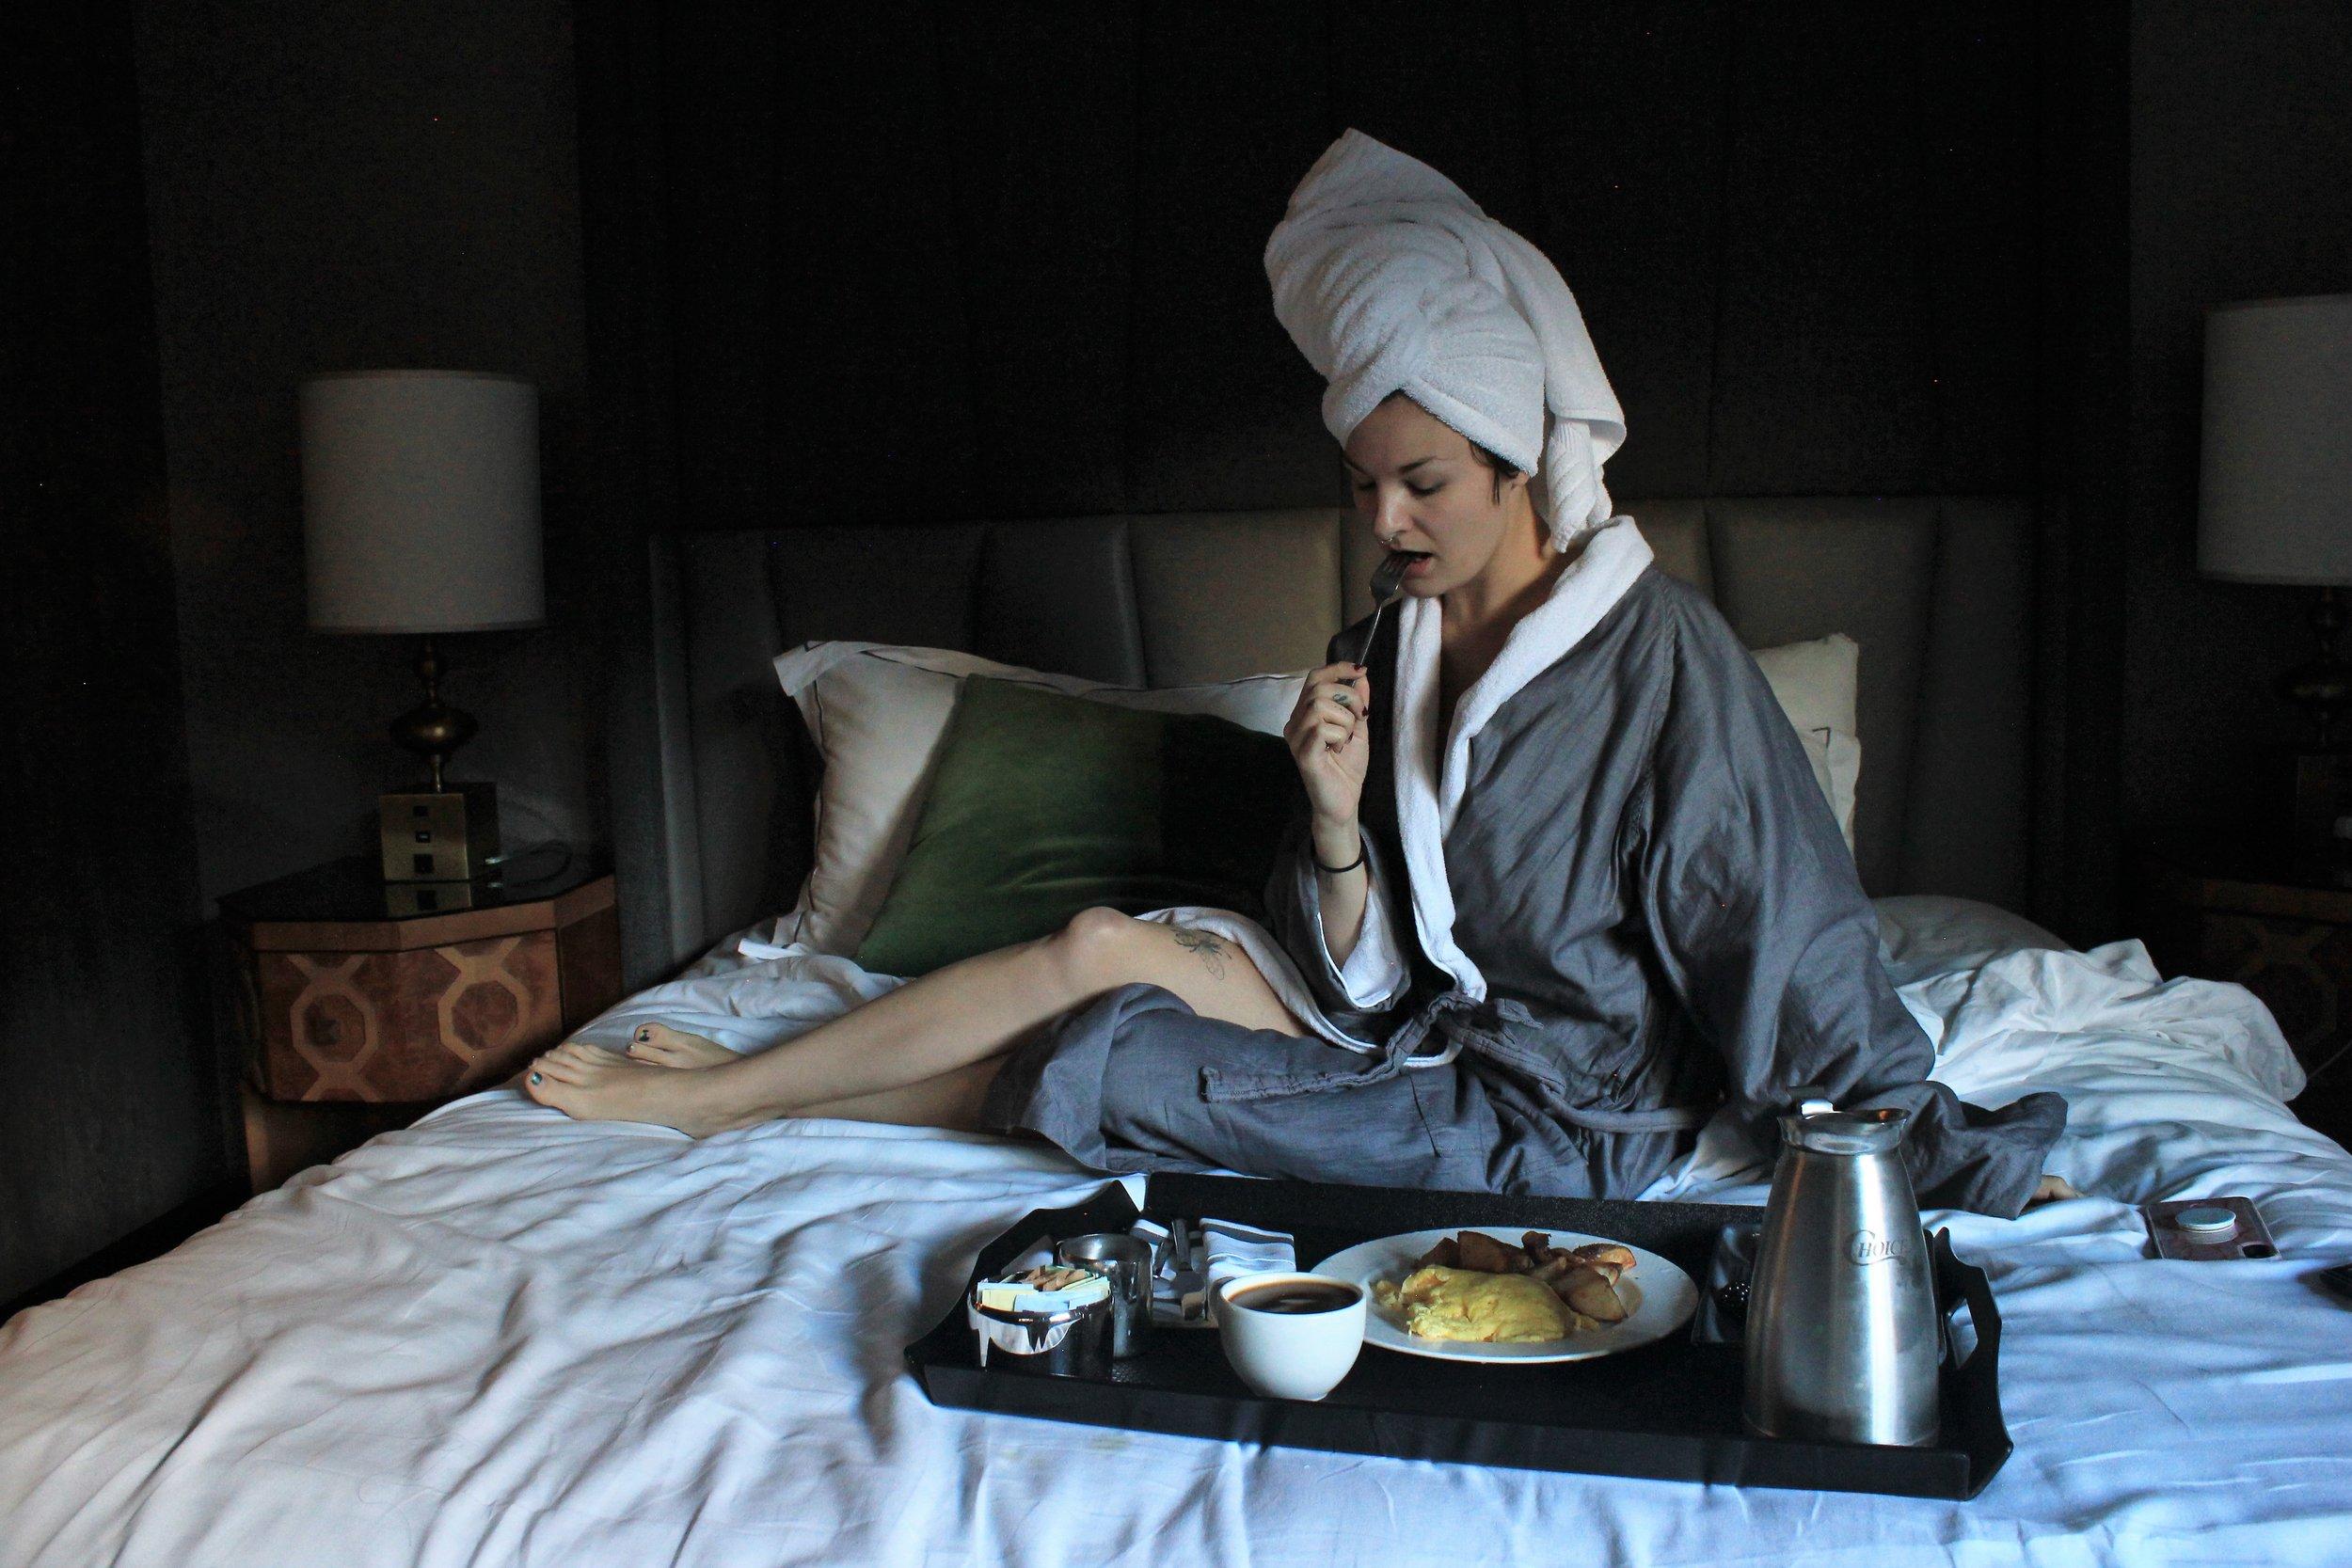 Breakfast in Bed - Kimpton's Mason and Rook in Washington DC